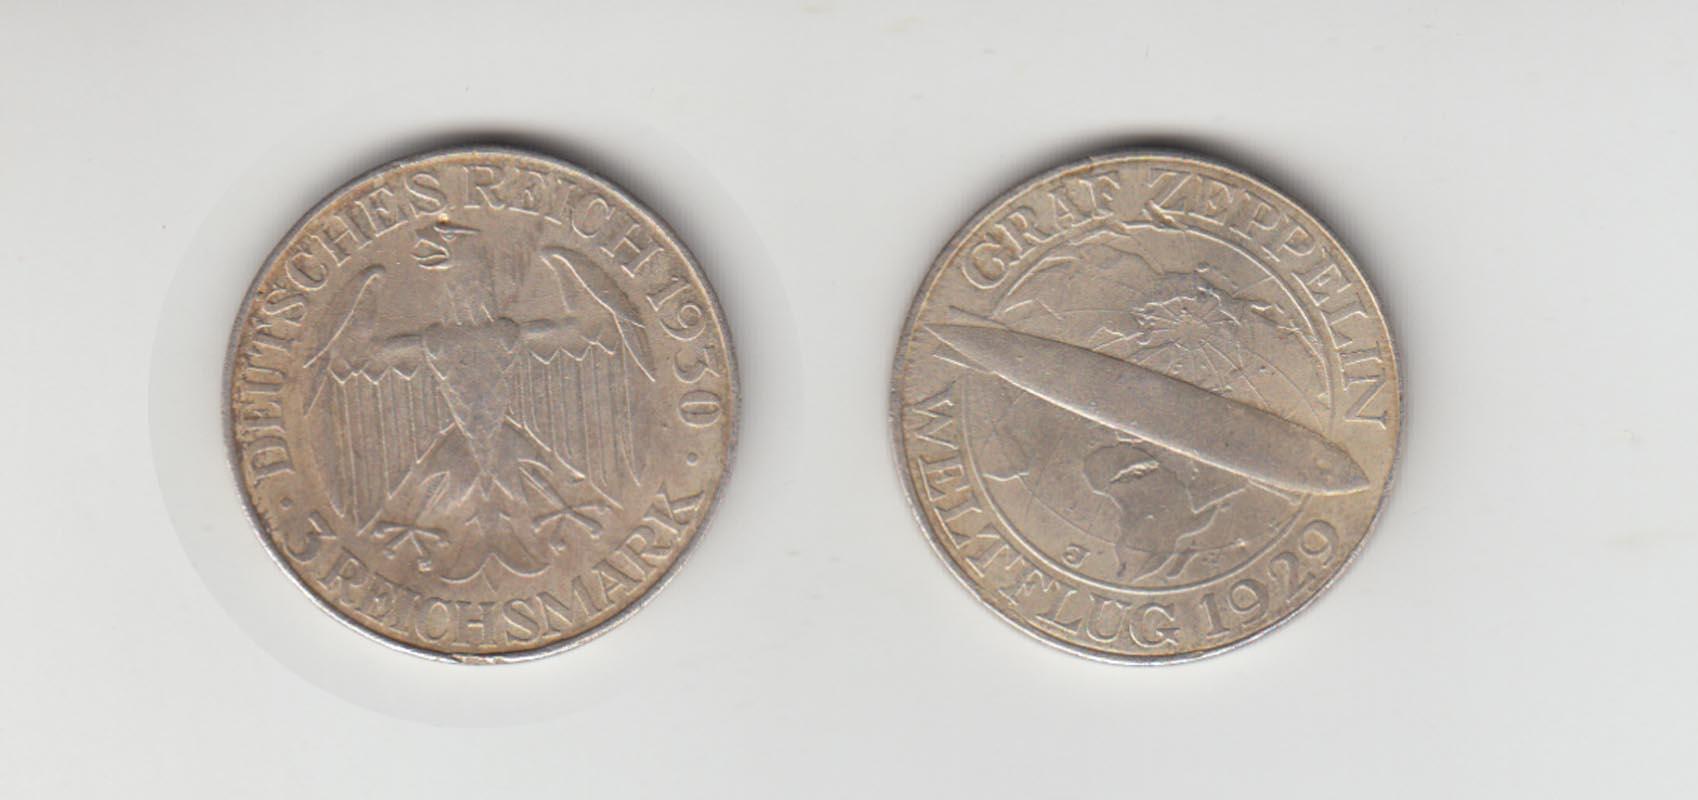 Münze Weimar Graf Zeppelin Weltflug 1929 3 Reichsmark 1929 A Jäger